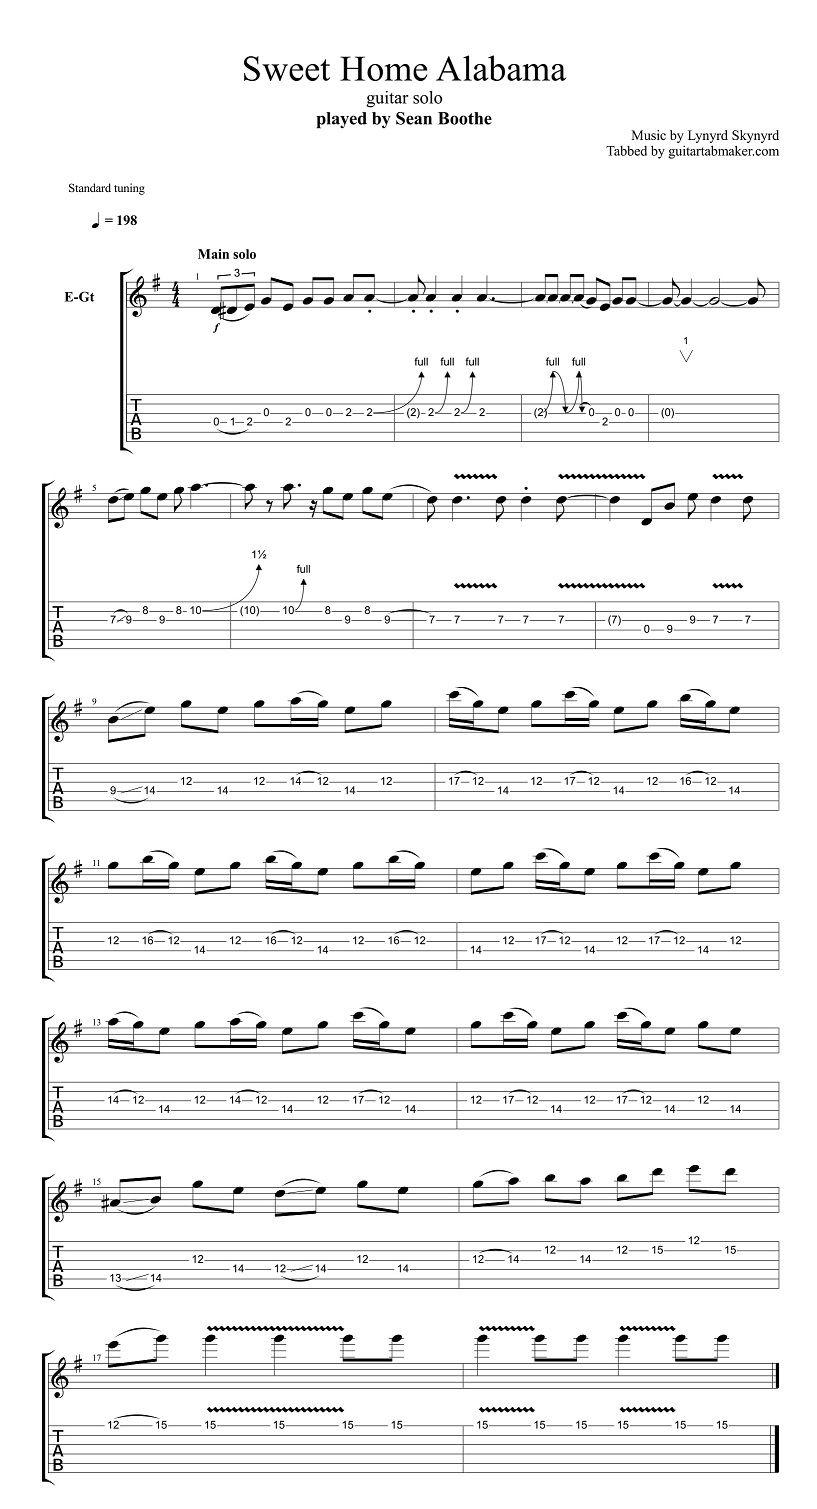 One accurate tab per song. Lynyrd Skynyrd Sweet Home Alabama Solo Tab Pdf Guitar Tab Guitar Pro Tab Download Electric Gui Guitar Tabs Songs Music Theory Guitar Learn Guitar Songs